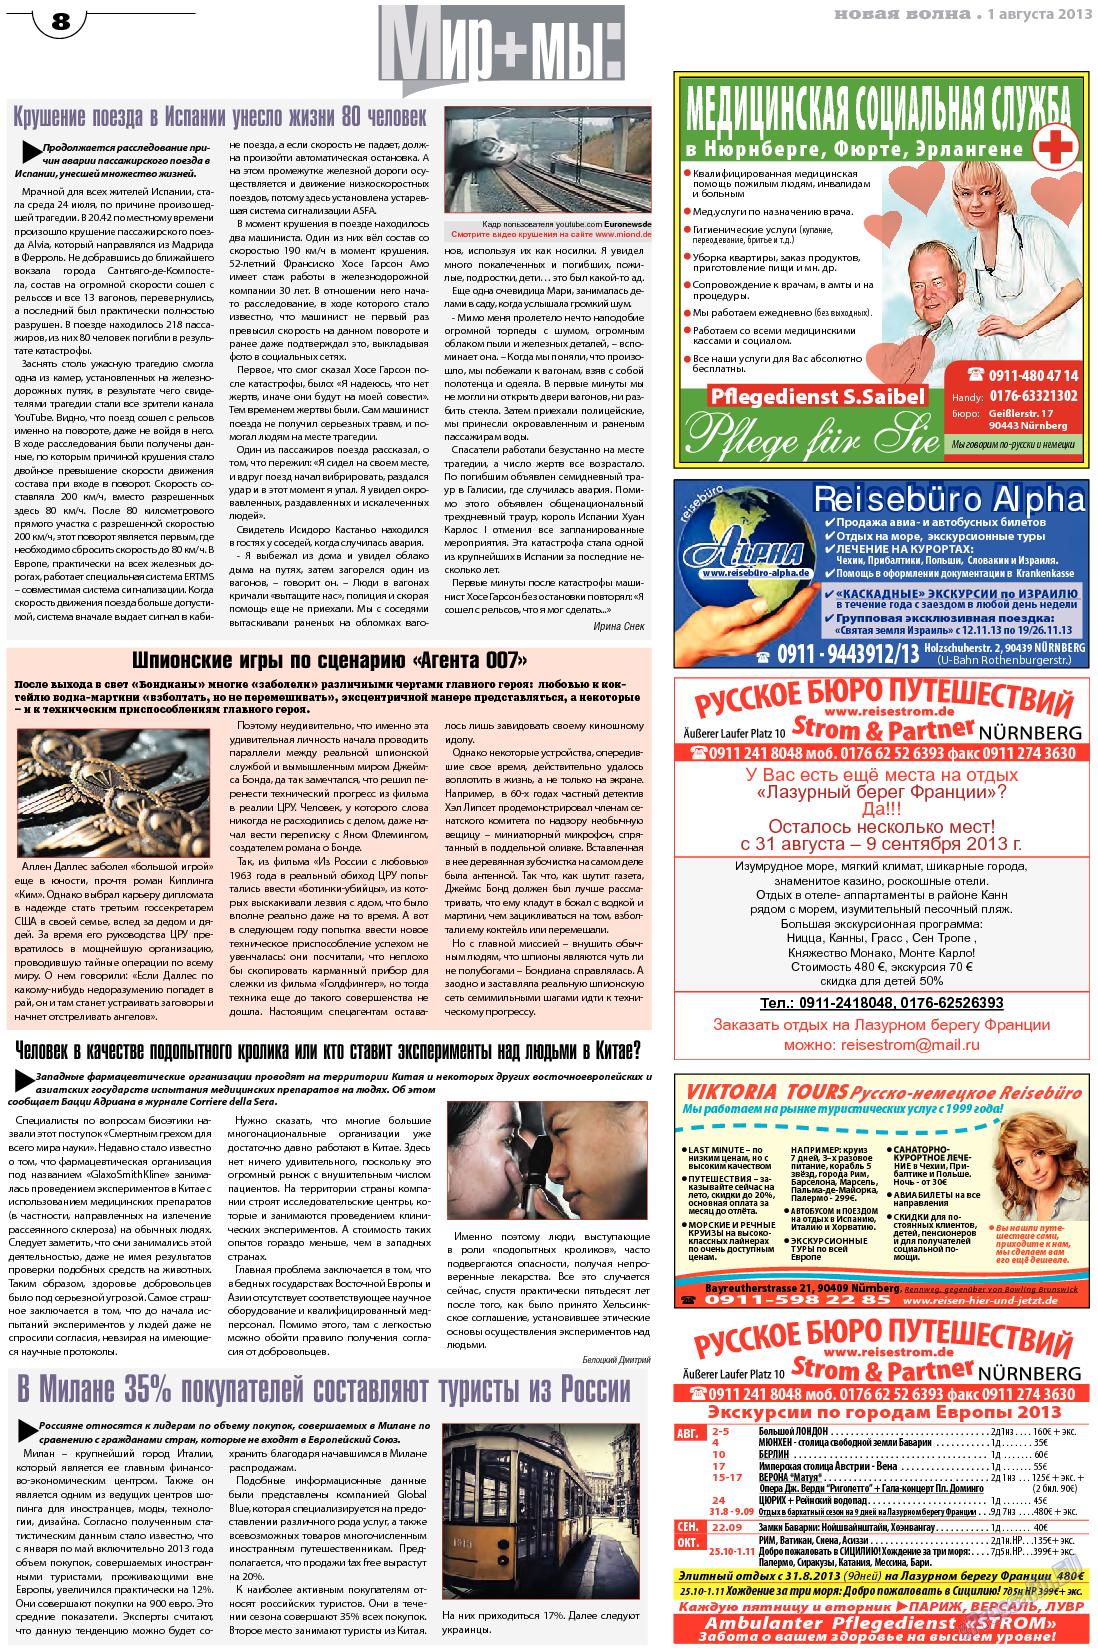 Новая Wолна (газета). 2013 год, номер 31, стр. 8